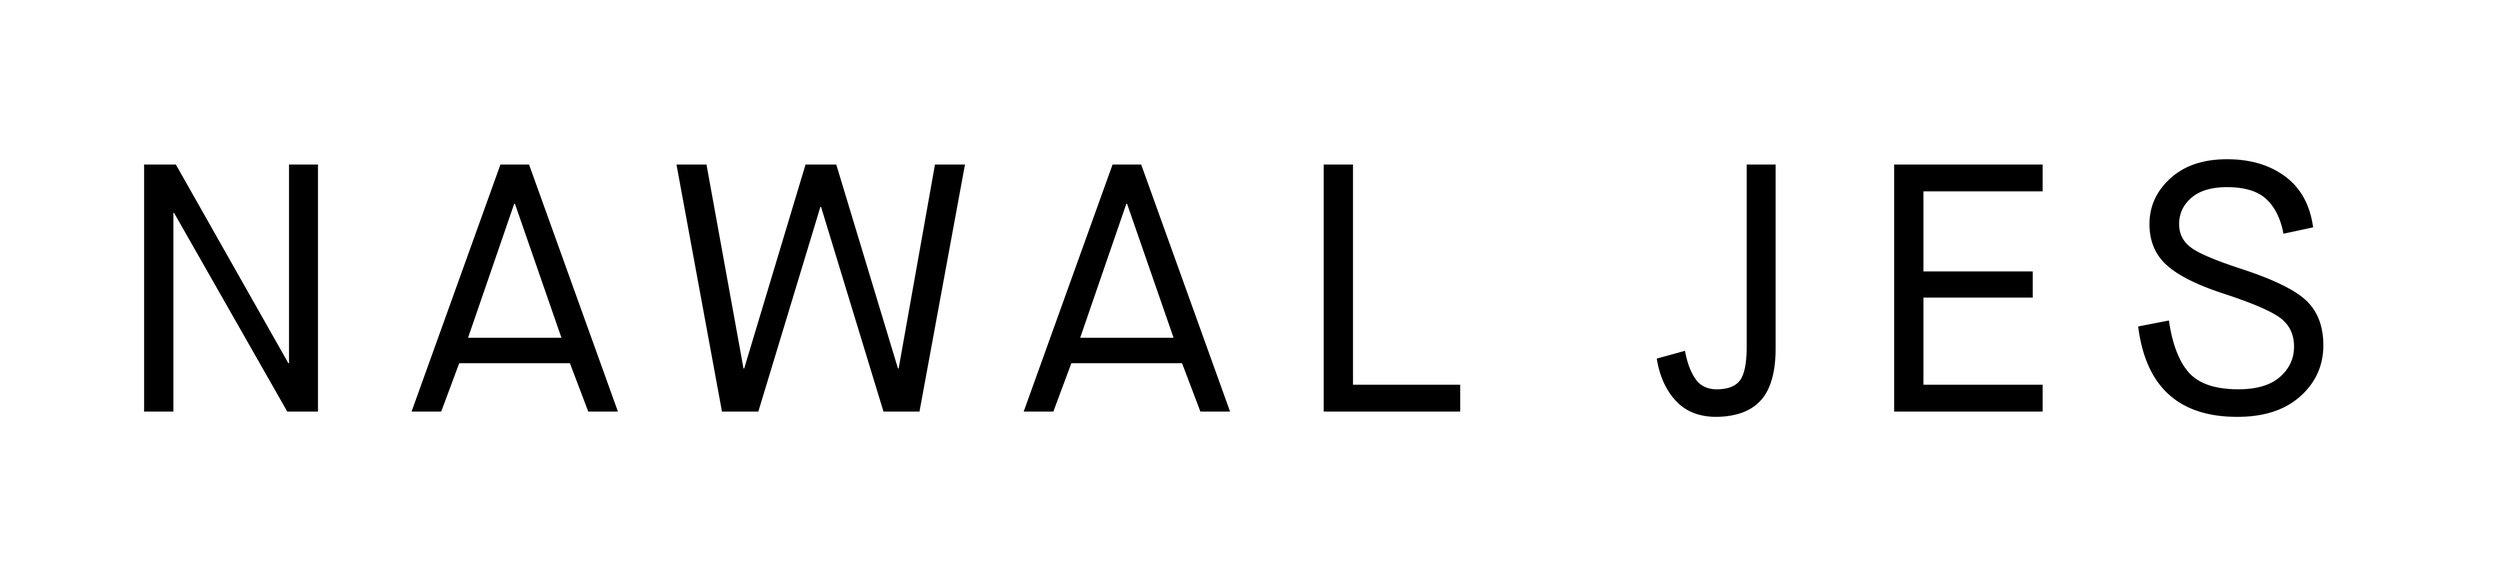 Nawal Jes new logo.jpg